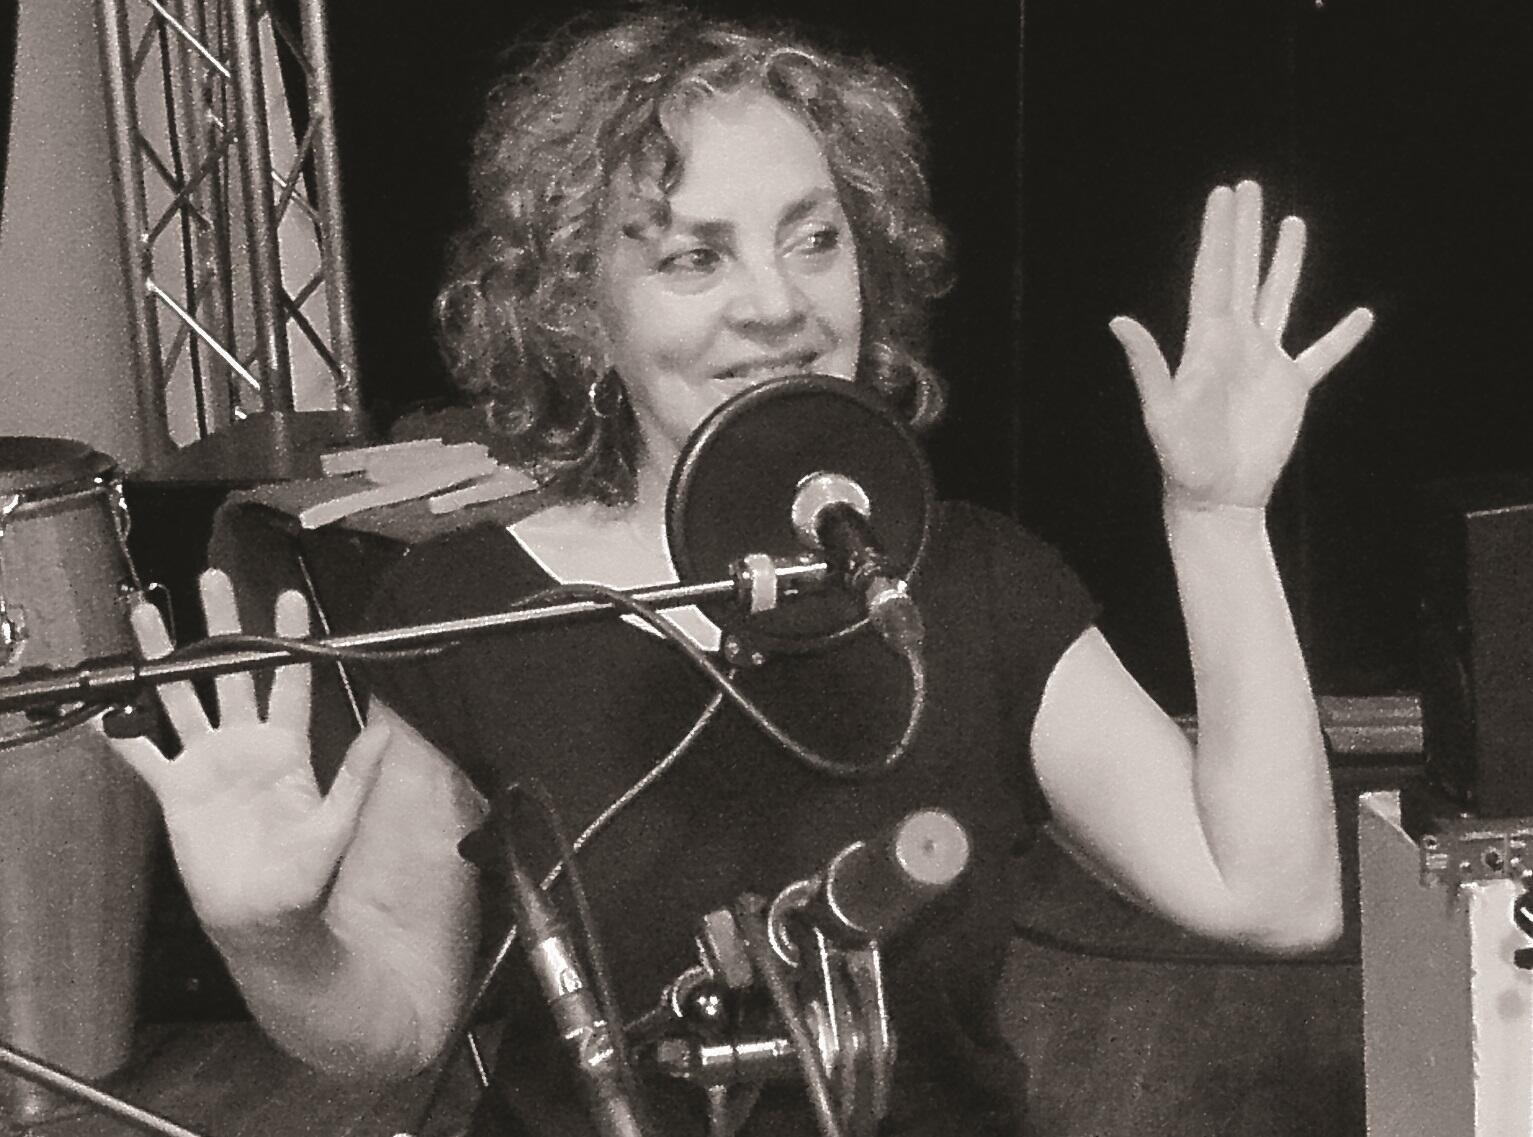 La percusionista franco-uruguaya Mirta Pozzi